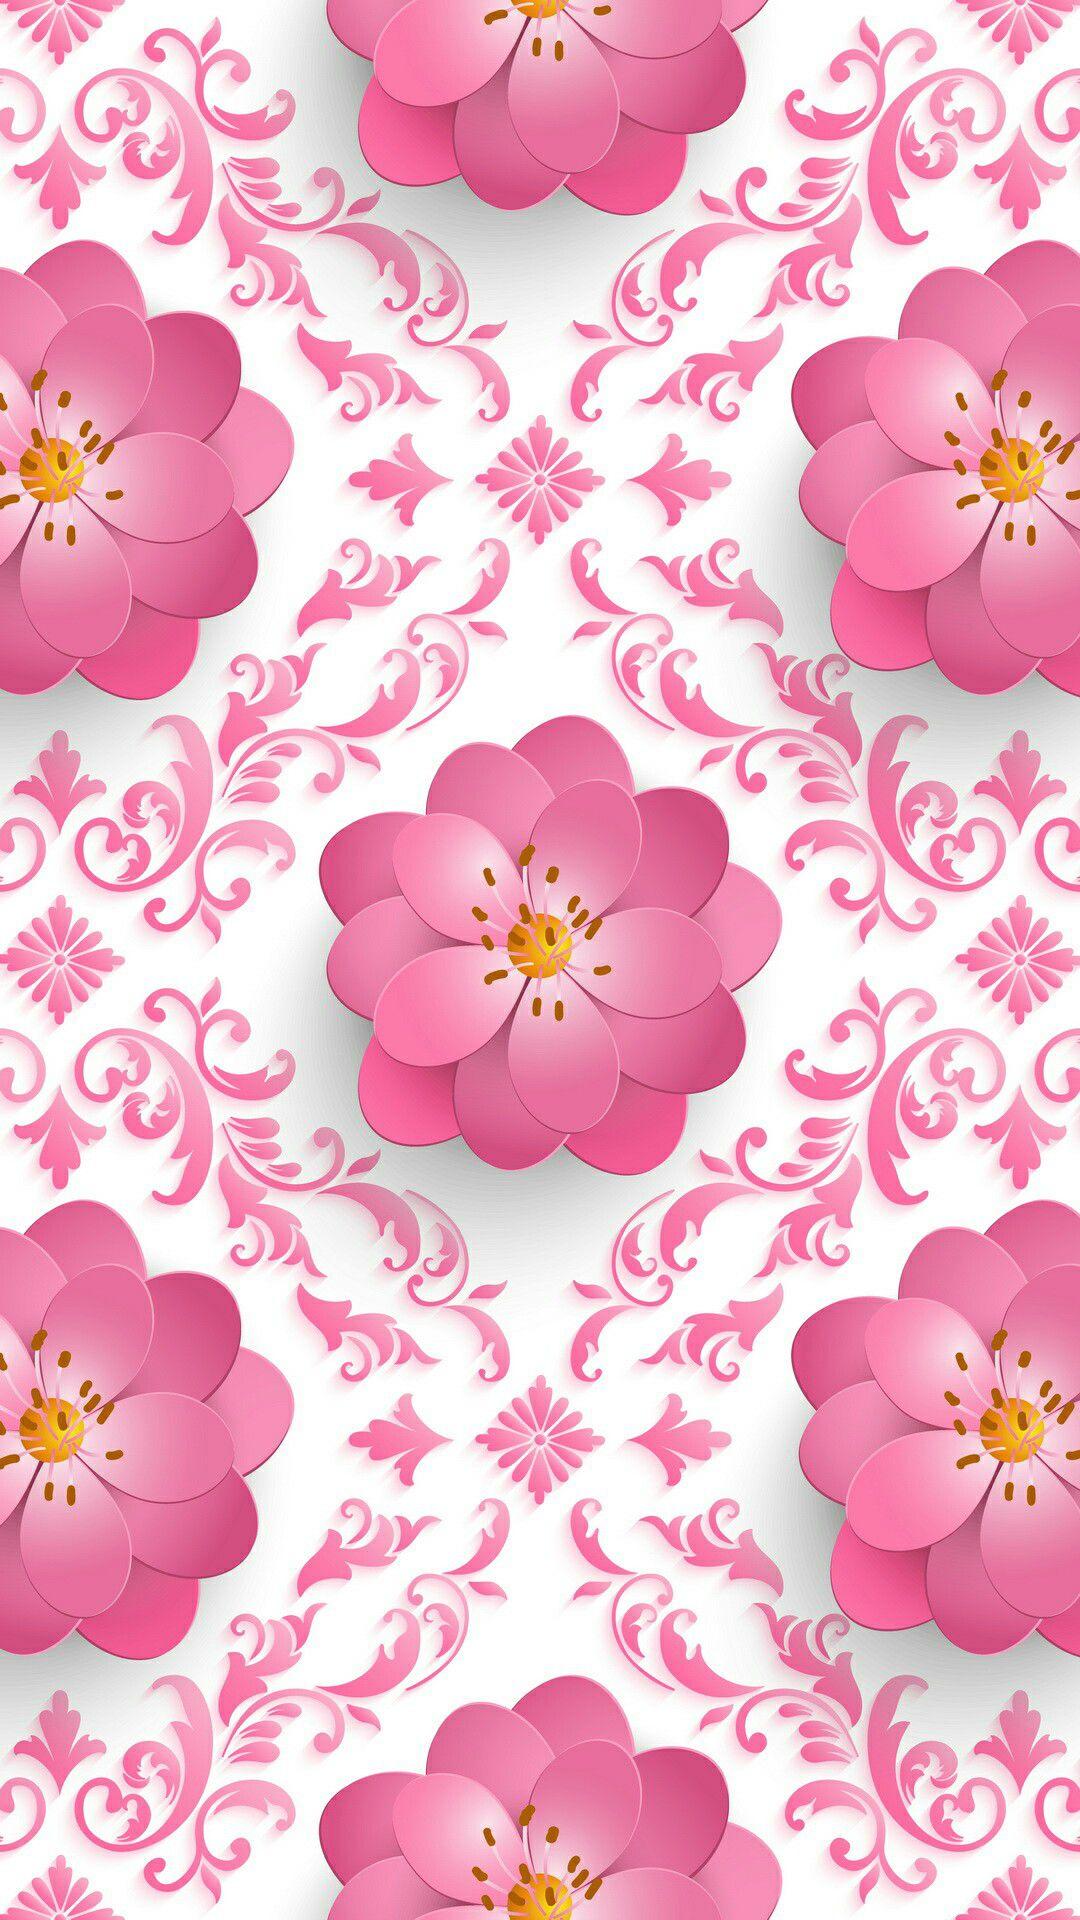 Imagens Para Papel De Parede Do Whatsapp , HD Wallpaper & Backgrounds